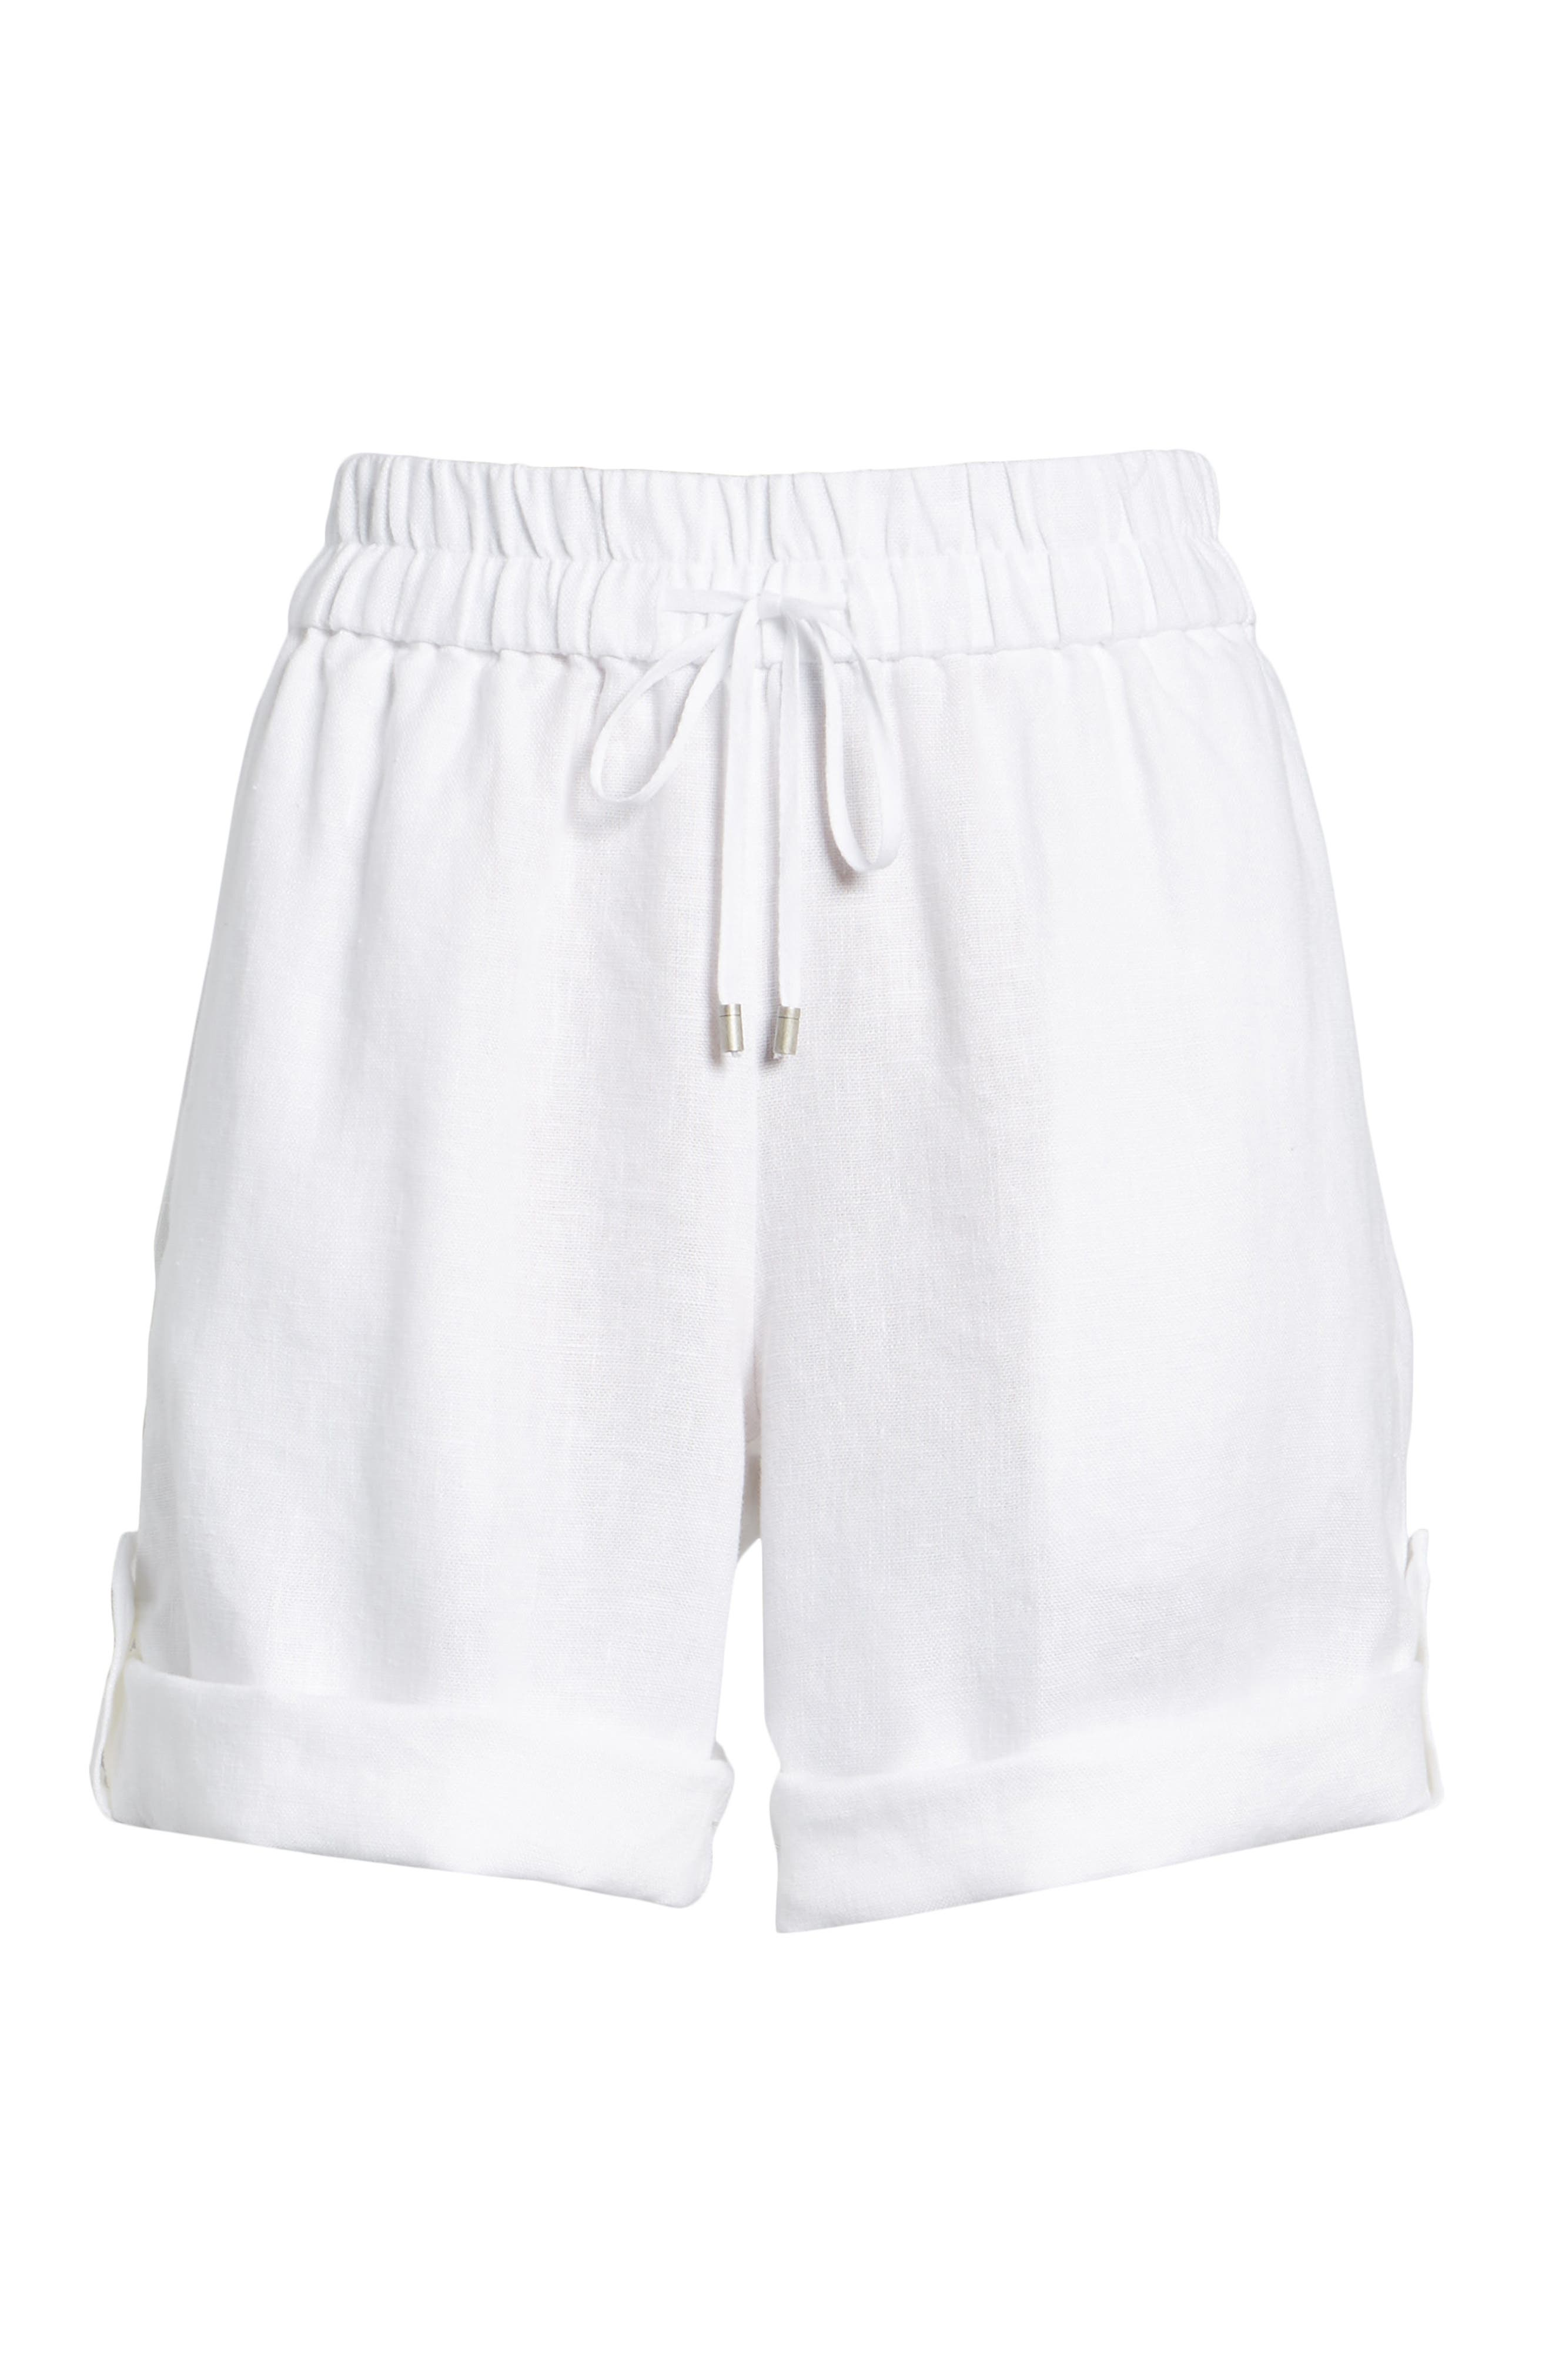 Rolled Organic Linen Shorts,                             Alternate thumbnail 6, color,                             White